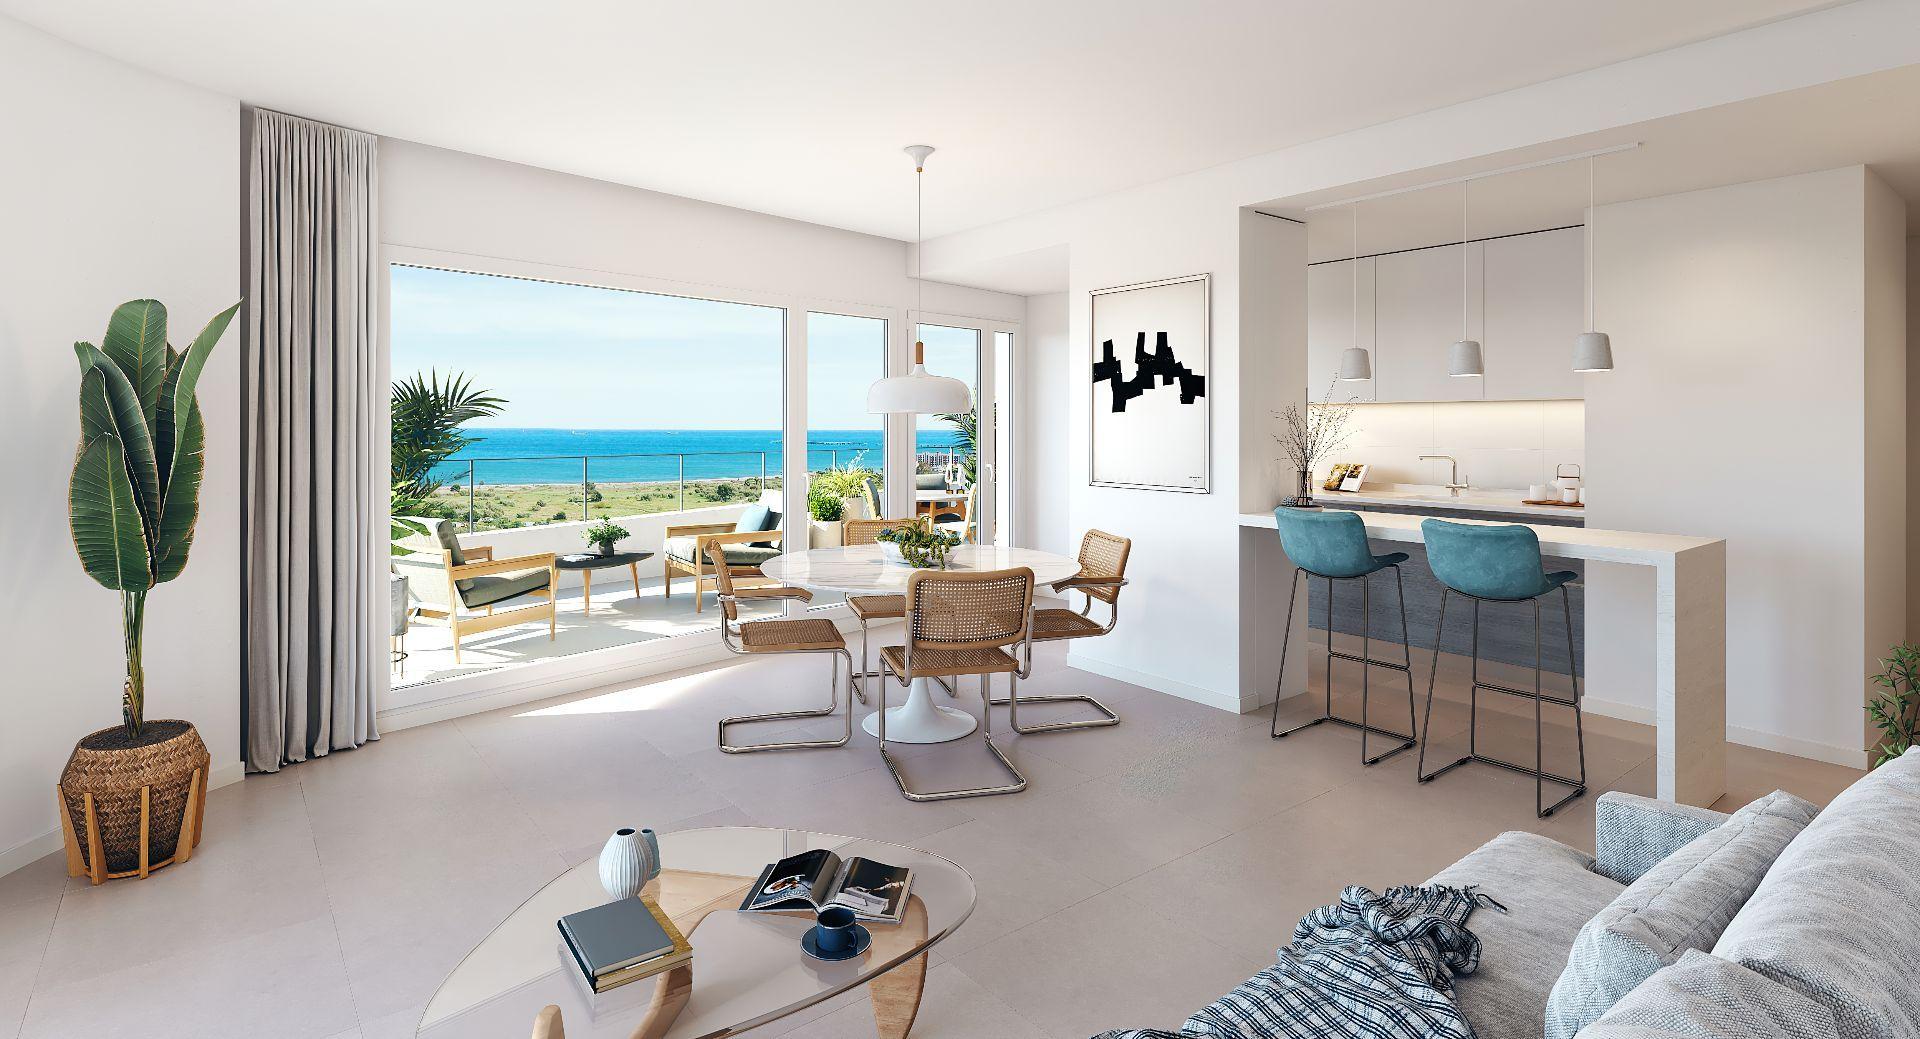 Apartment in Canet d'En Berenguer, for sale